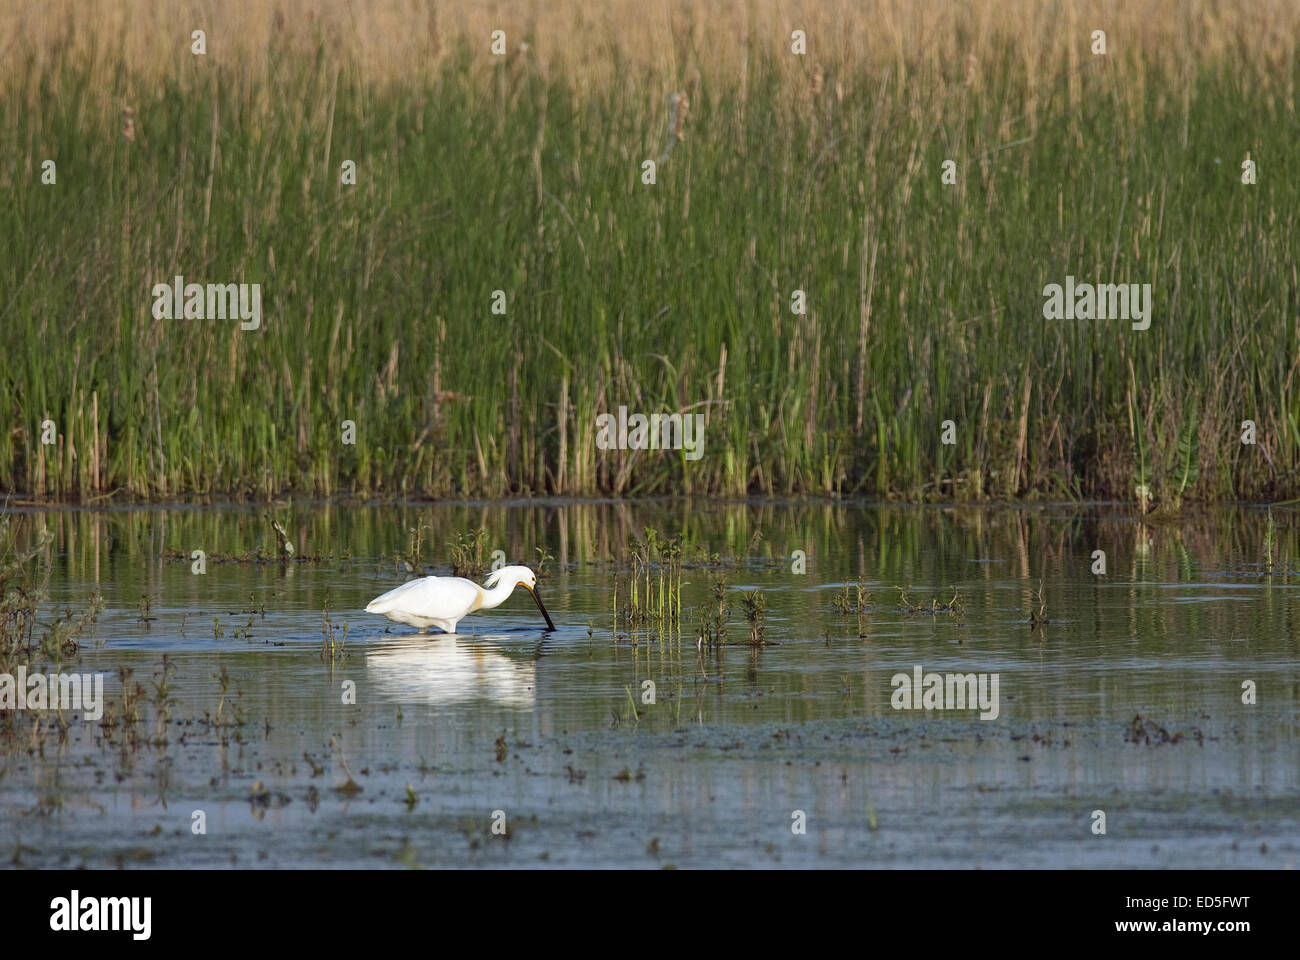 Common Spoonbill o Eurasian Spoonbill (Platalea leucorodia), Danube delta, Romania, Europa - Stock Image